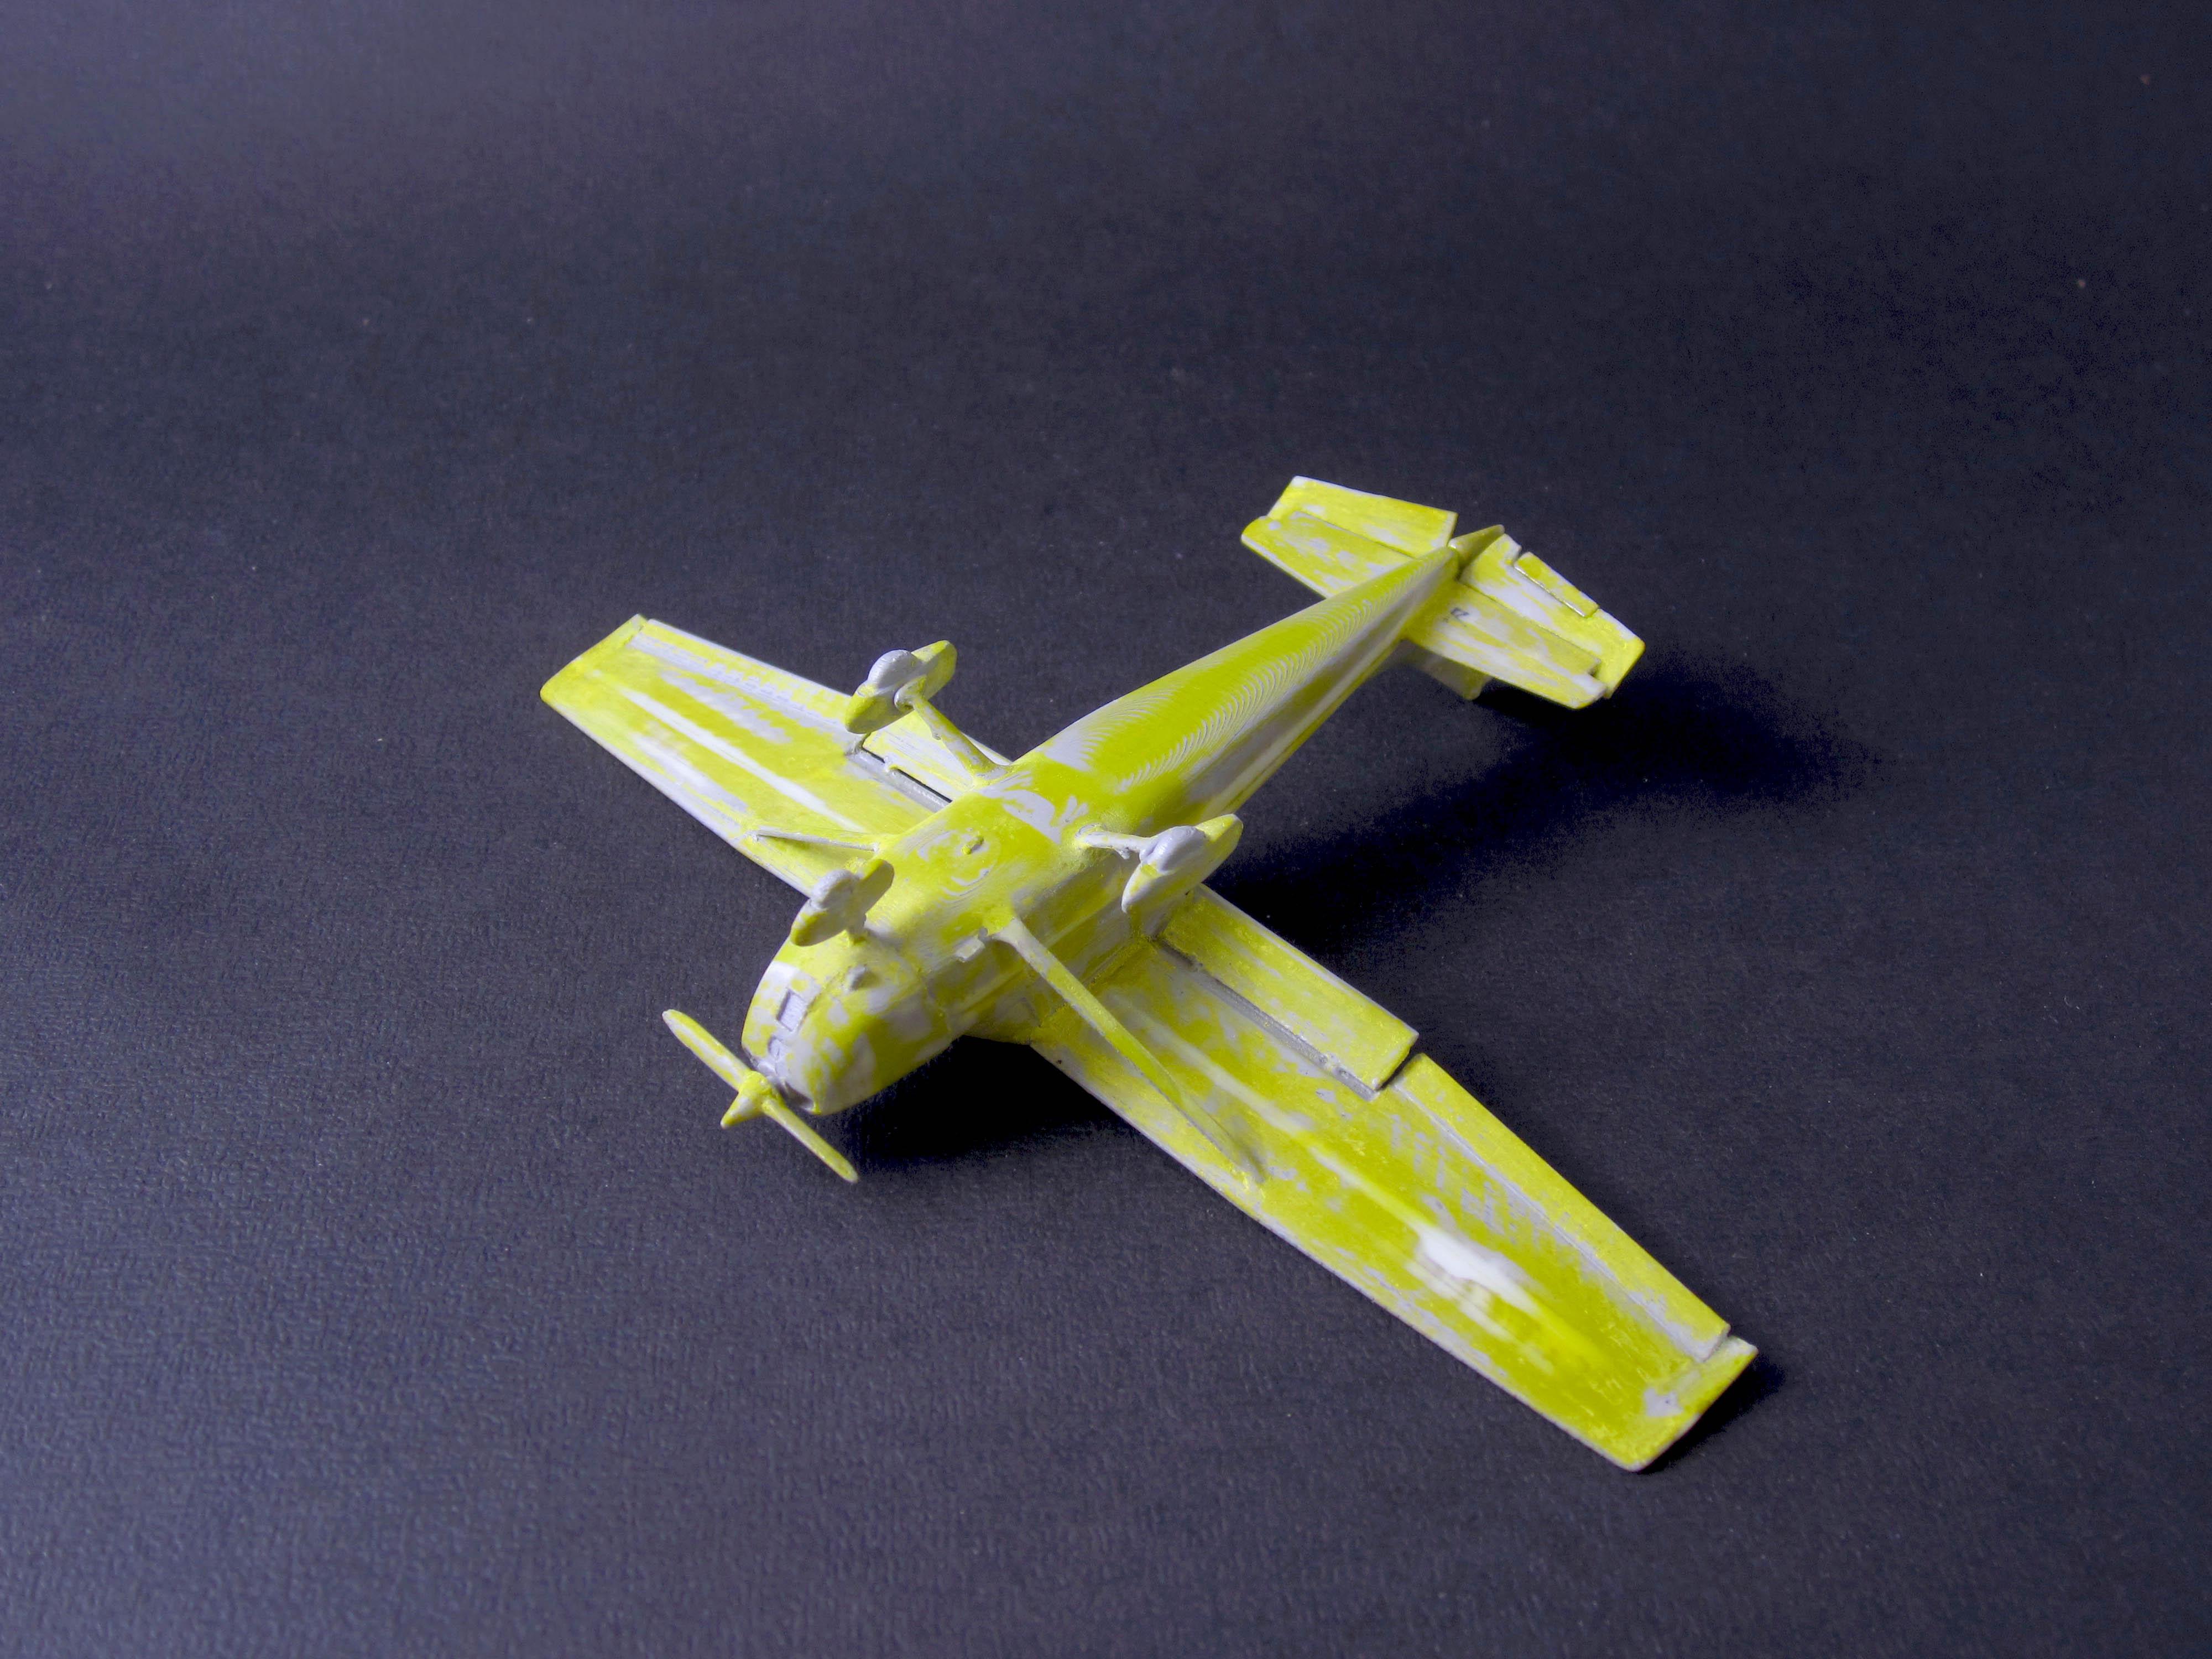 2 cessna 172 skyhawk - pla - prime and putty 3 - IMG_2348 copy.jpg Download free STL file Cessna 172 Skyhawk 1:72 • 3D print design, heri__suprapto